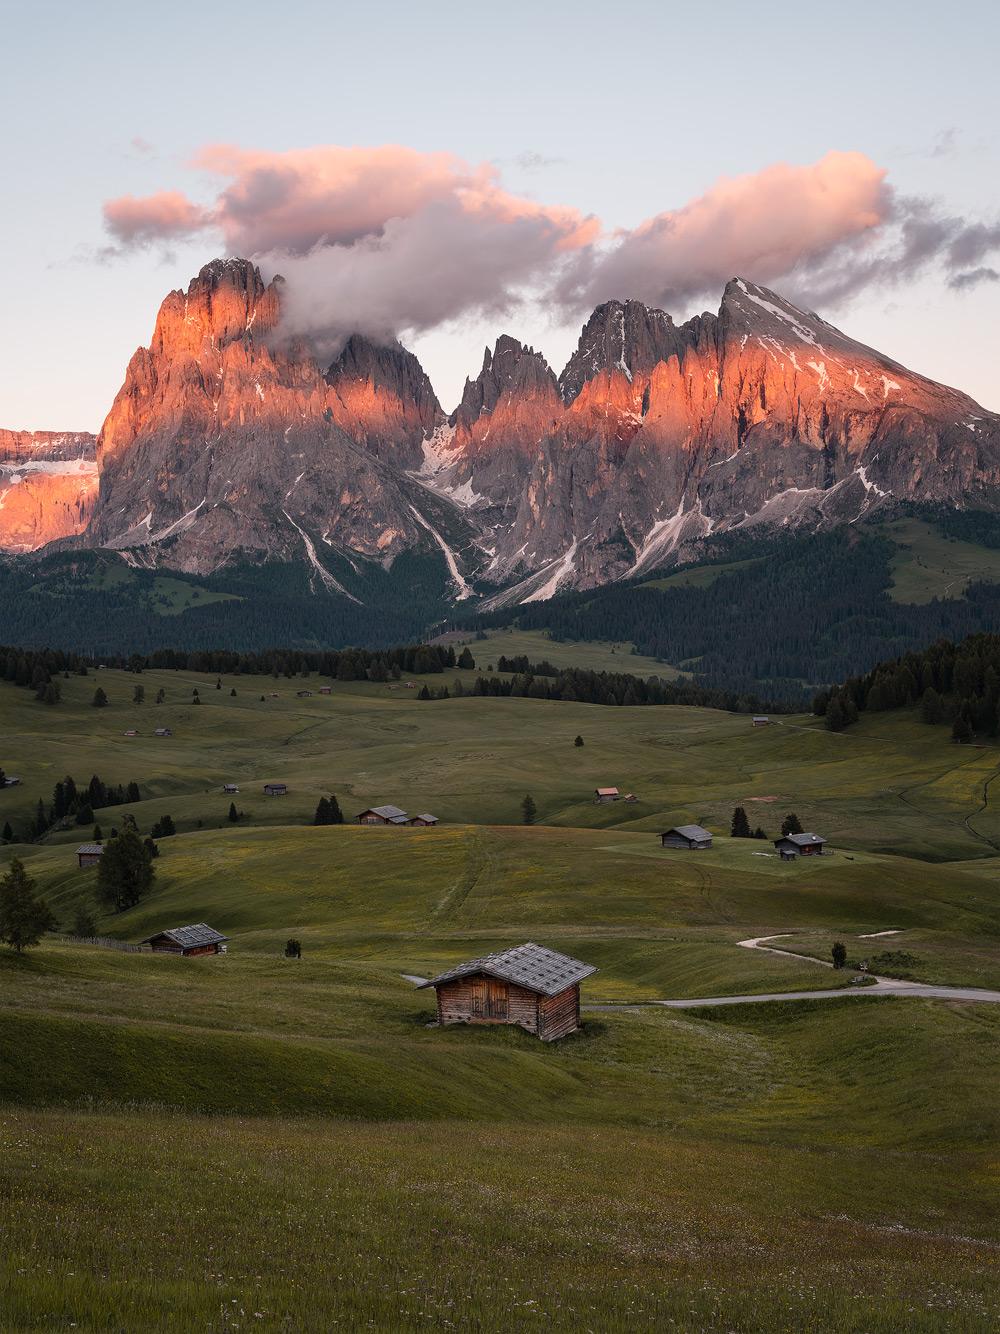 Alpe di Siusi & Langkofel Group, Dolomites, South Tyrol, Italy by Nils Leonhardt